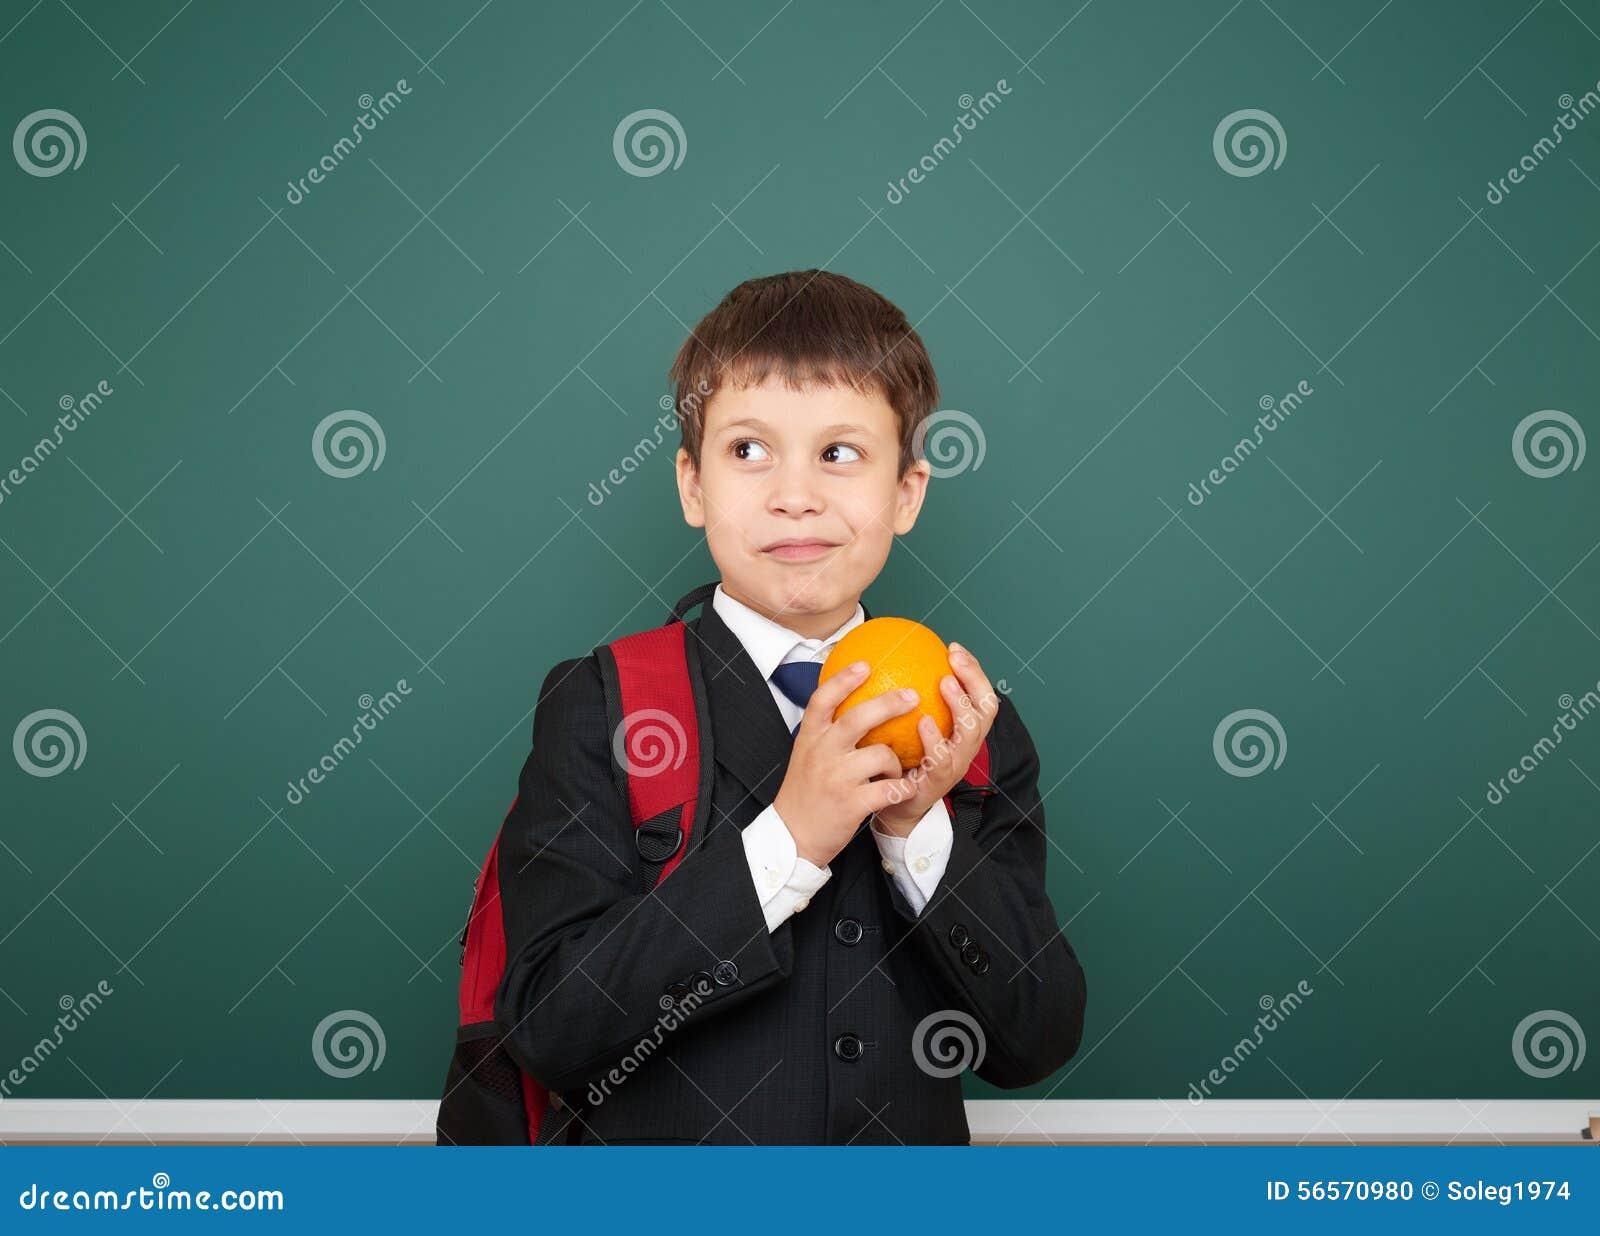 Download Μαθητής με το πορτοκάλι και ο σχολικός πίνακας Στοκ Εικόνες - εικόνα από καθαρίστε, σχέδιο: 56570980